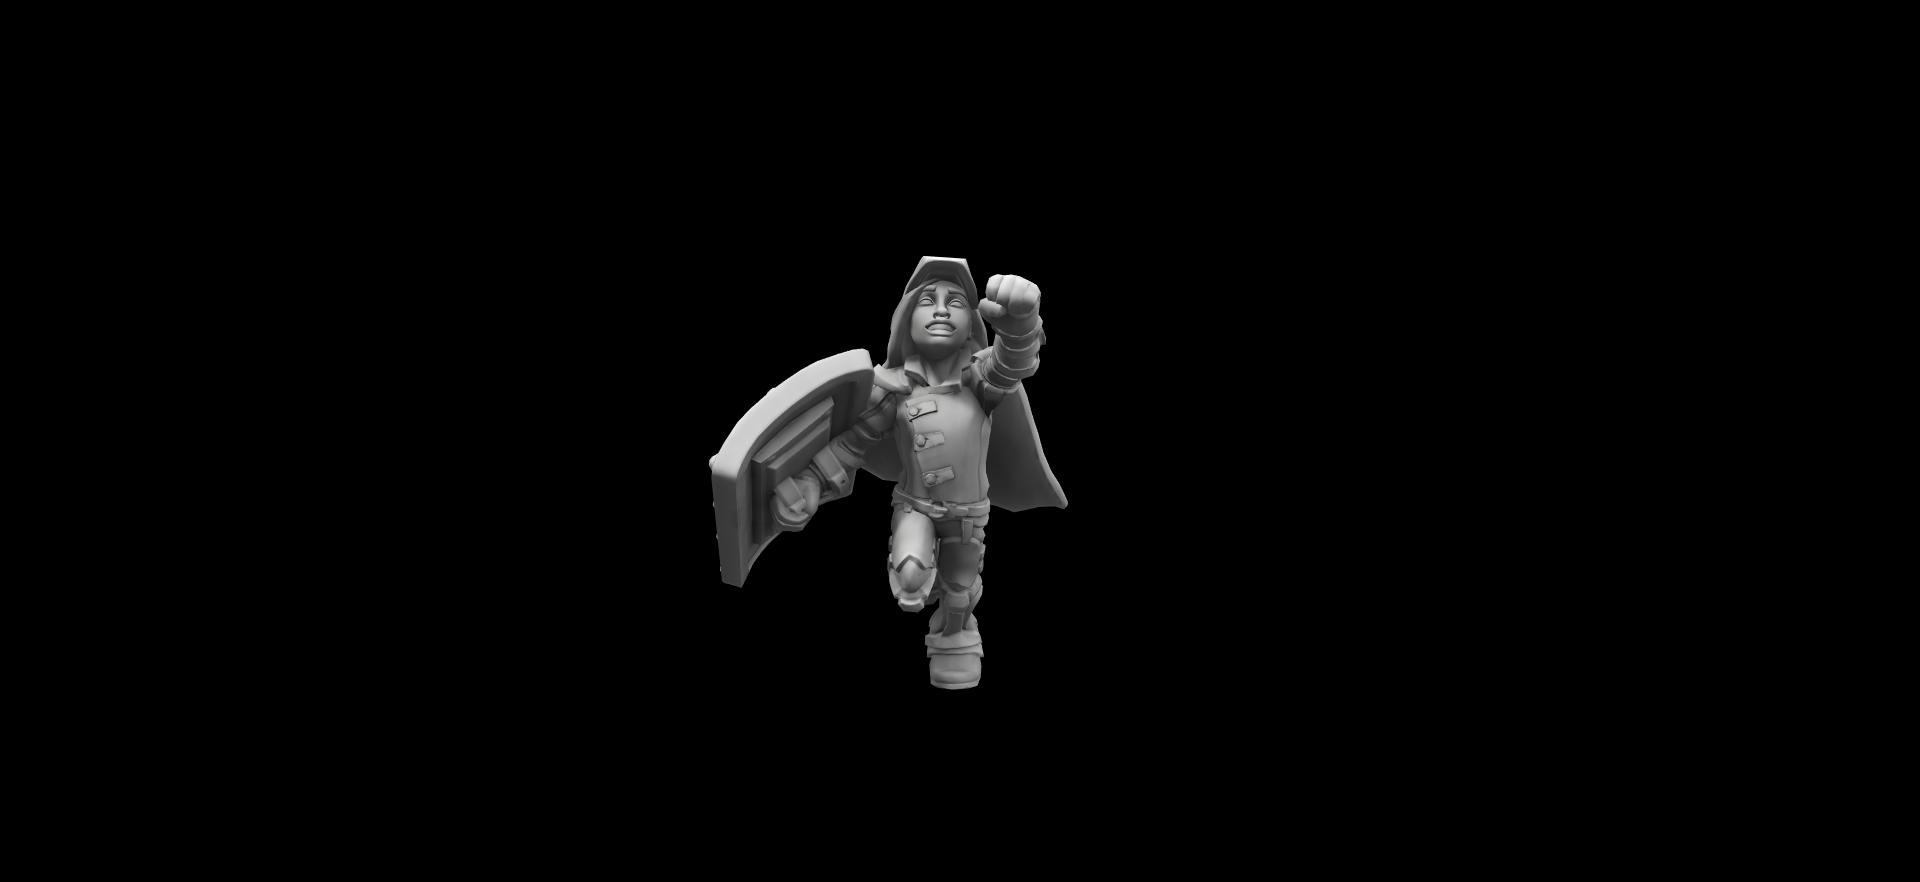 HeroForgeScreenshot (28)